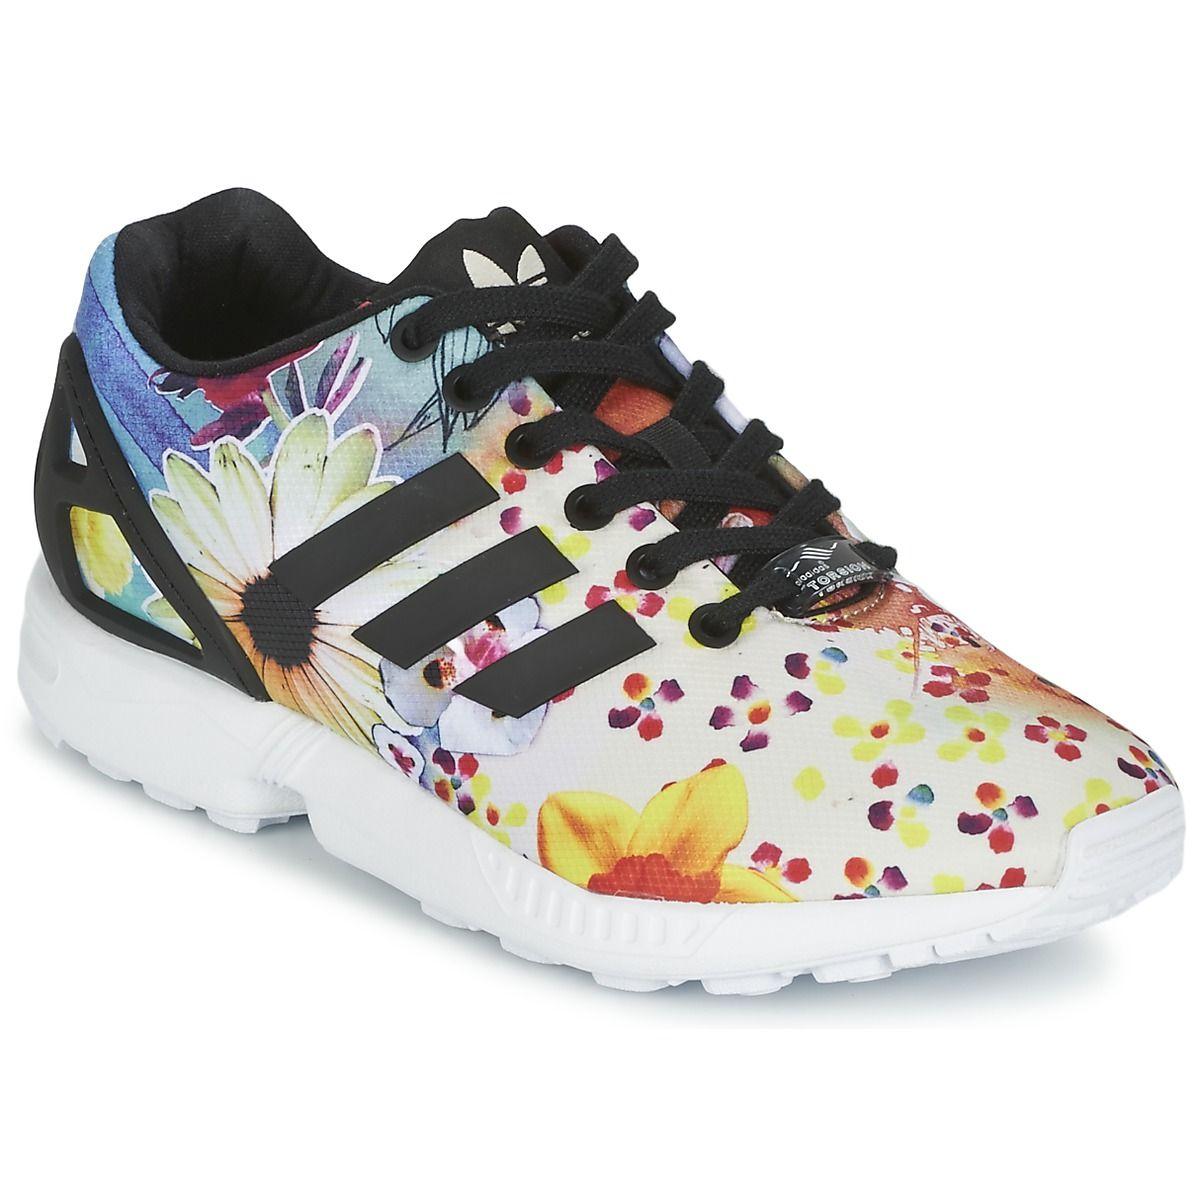 factory price 38eb4 69aa6 Baskets Adidas Originals ZX FLUX W Multicolore prix promo Baskets Femme  Spartoo 99.99 €